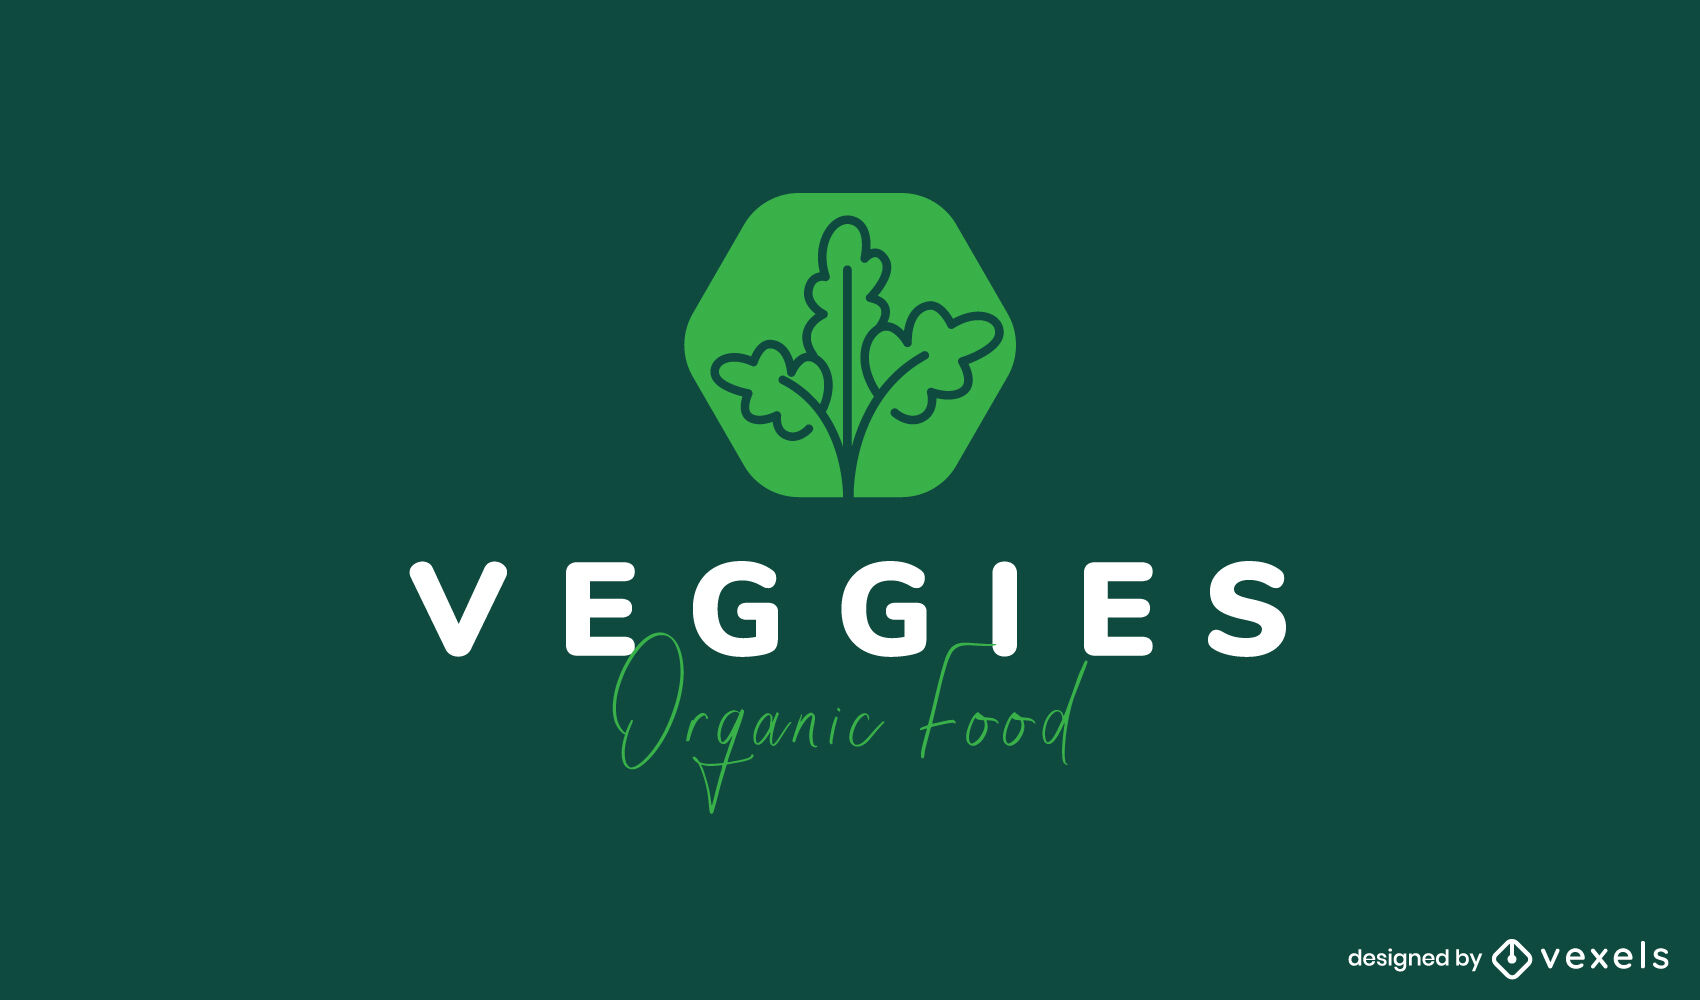 Vegetable organic food logo